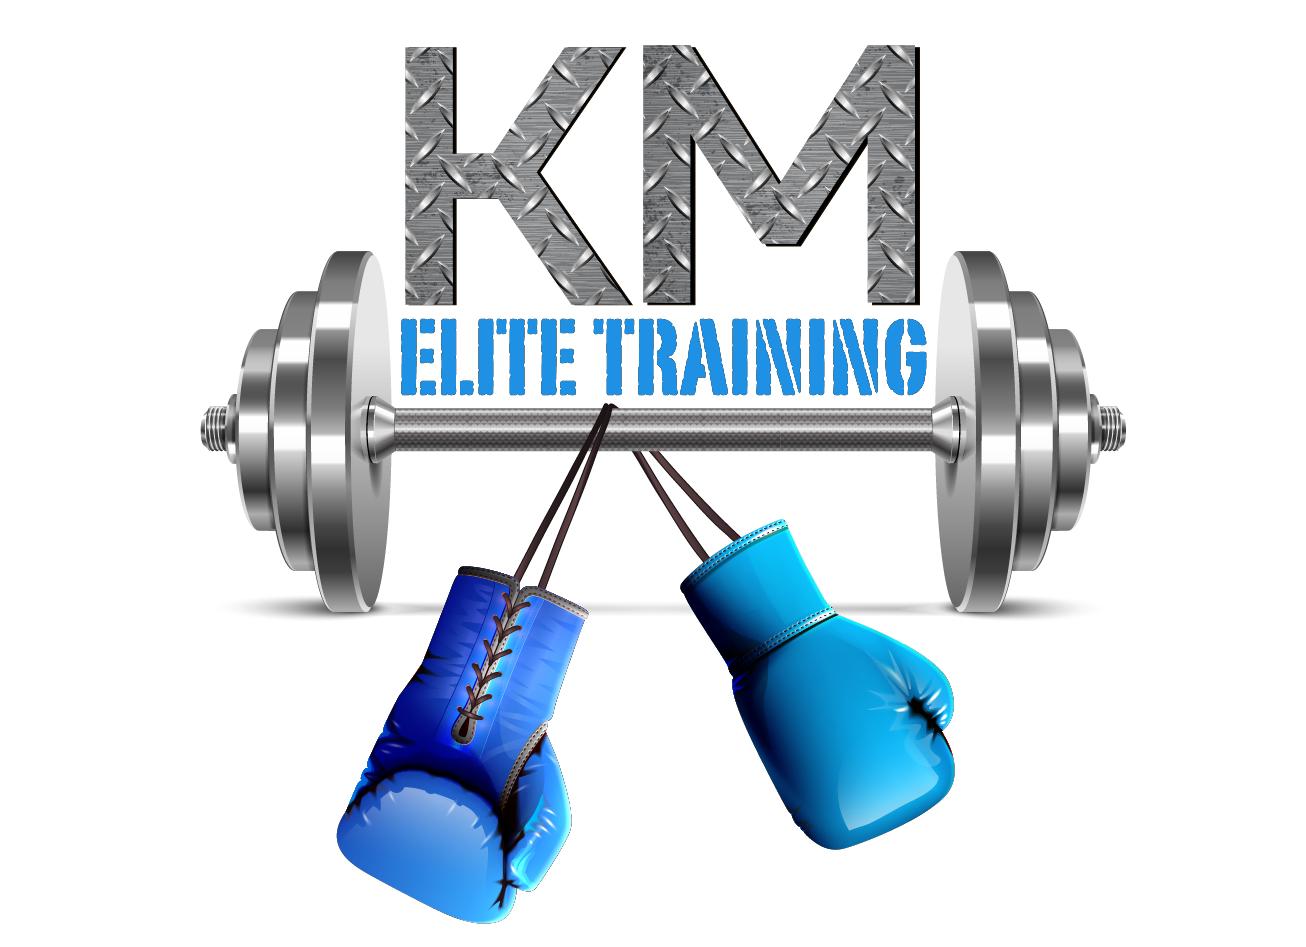 KM Elite Training, personal training Boca Raton Florida